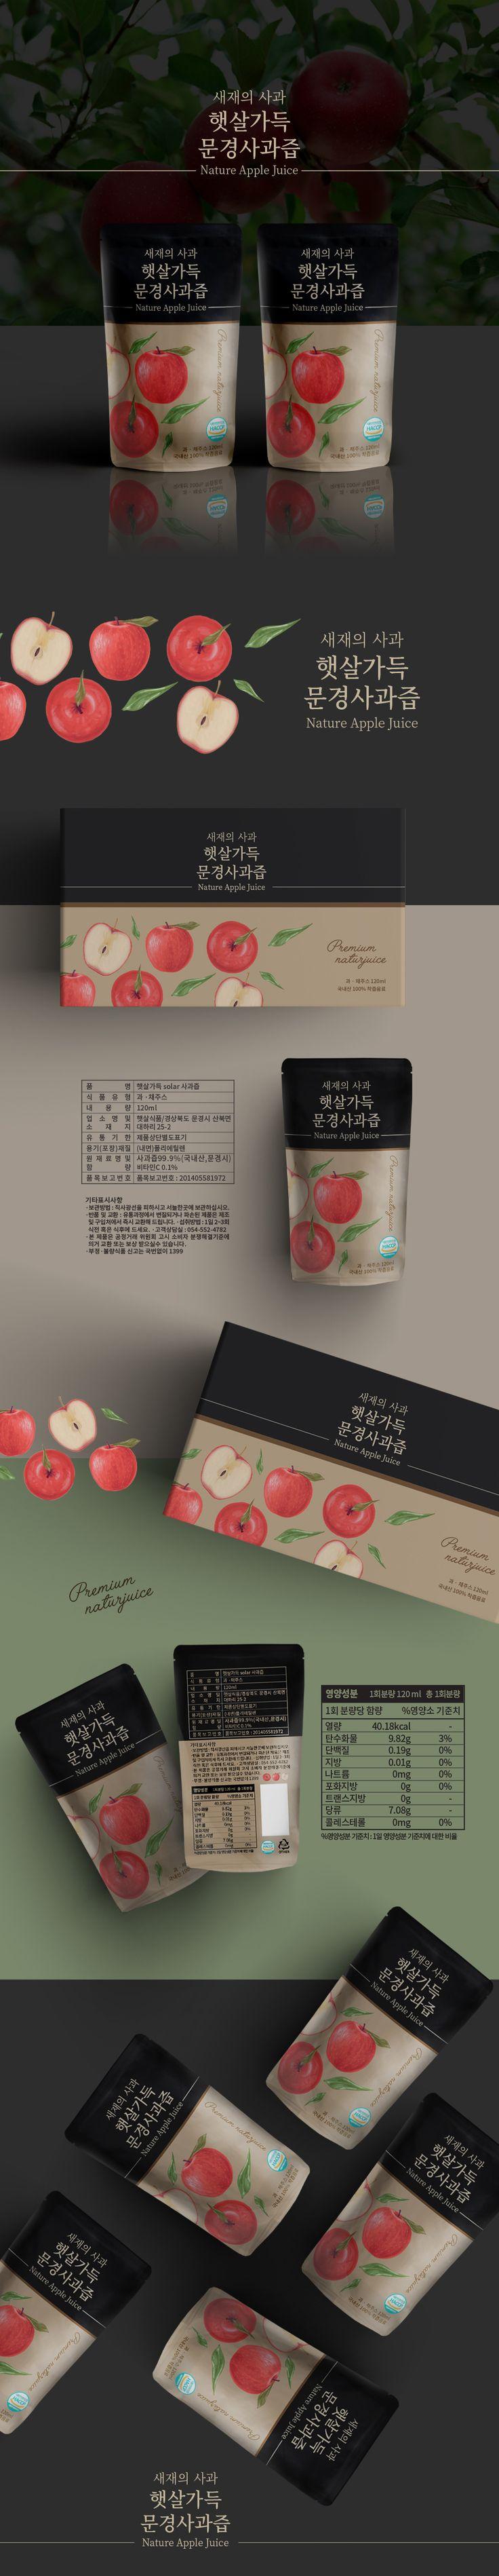 Design by suyun51 / #아이덴티티 #identity #디자인 #디자이너 #라우드소싱 #레퍼런스 #콘테스트 #package #design #포트폴리오 #디자인의뢰 #공모전 #라벨 #illust #패키지 #패키지디자인 #일러스트 #작업 #color #타이포그래피 #아이콘 #곡선 #reference #food